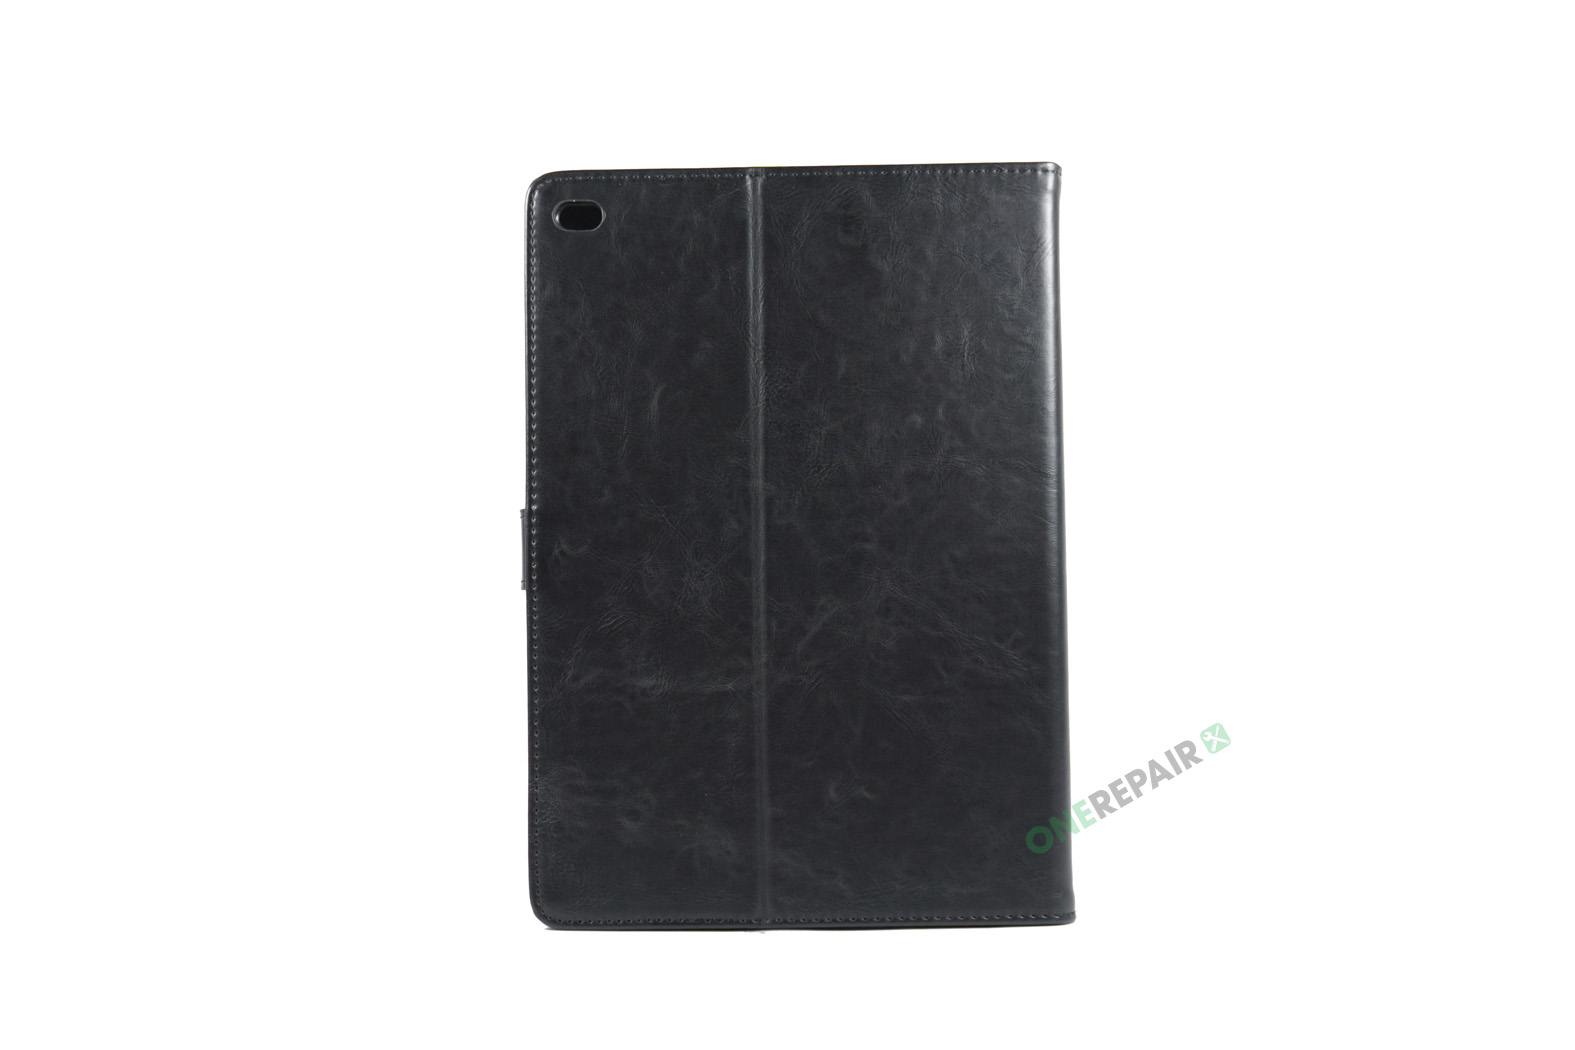 351755_iPad_Air2_2_A1566_A1567_Flipcover_Boeg_Sort_Book_00002